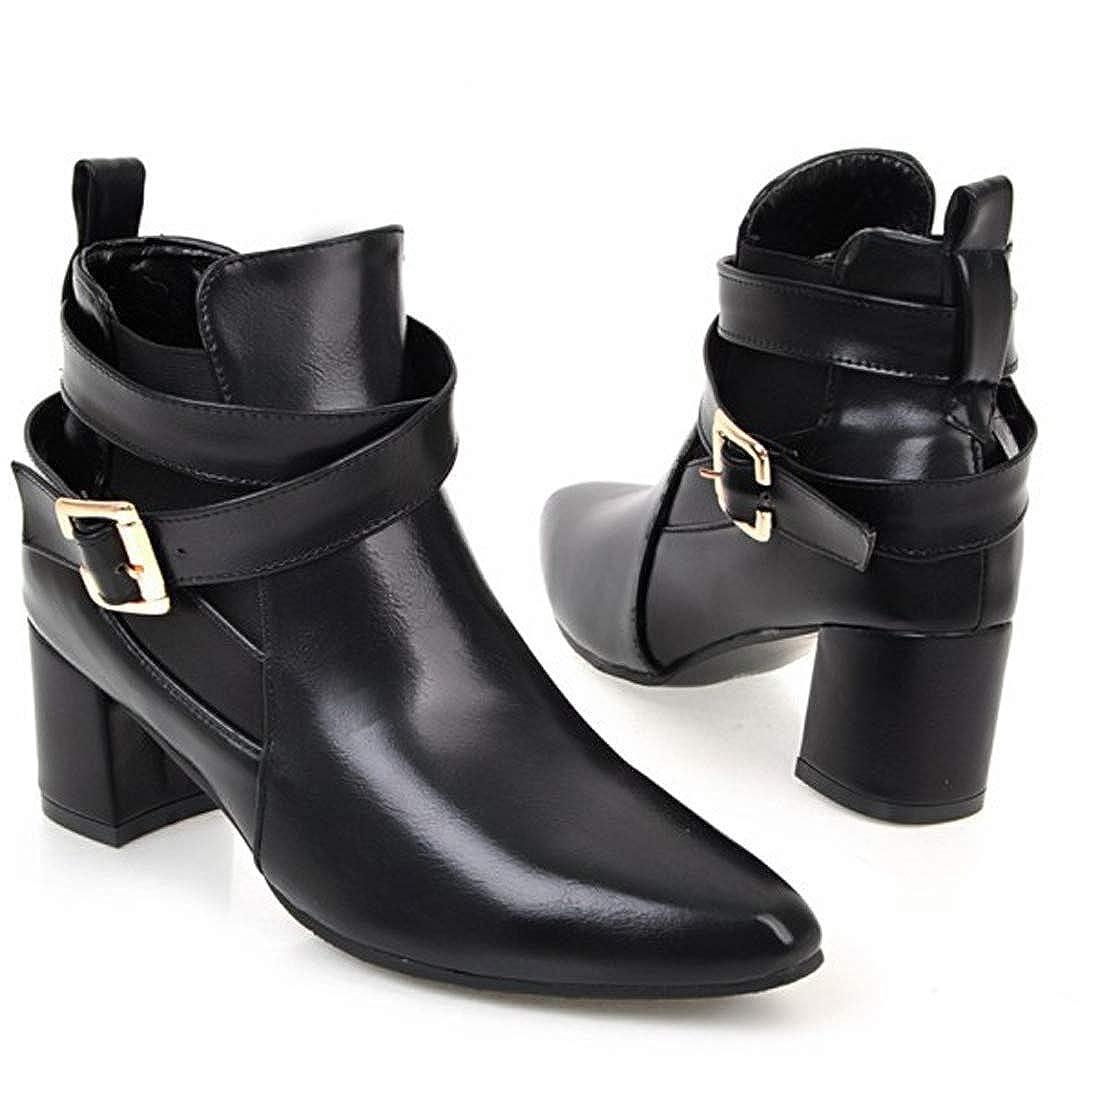 SERAPH Schuhe Damen Damen Damen Spitzschuh Schnalle Blockabsatz Martin Stiefeletten C-52 schwarz 025e8f